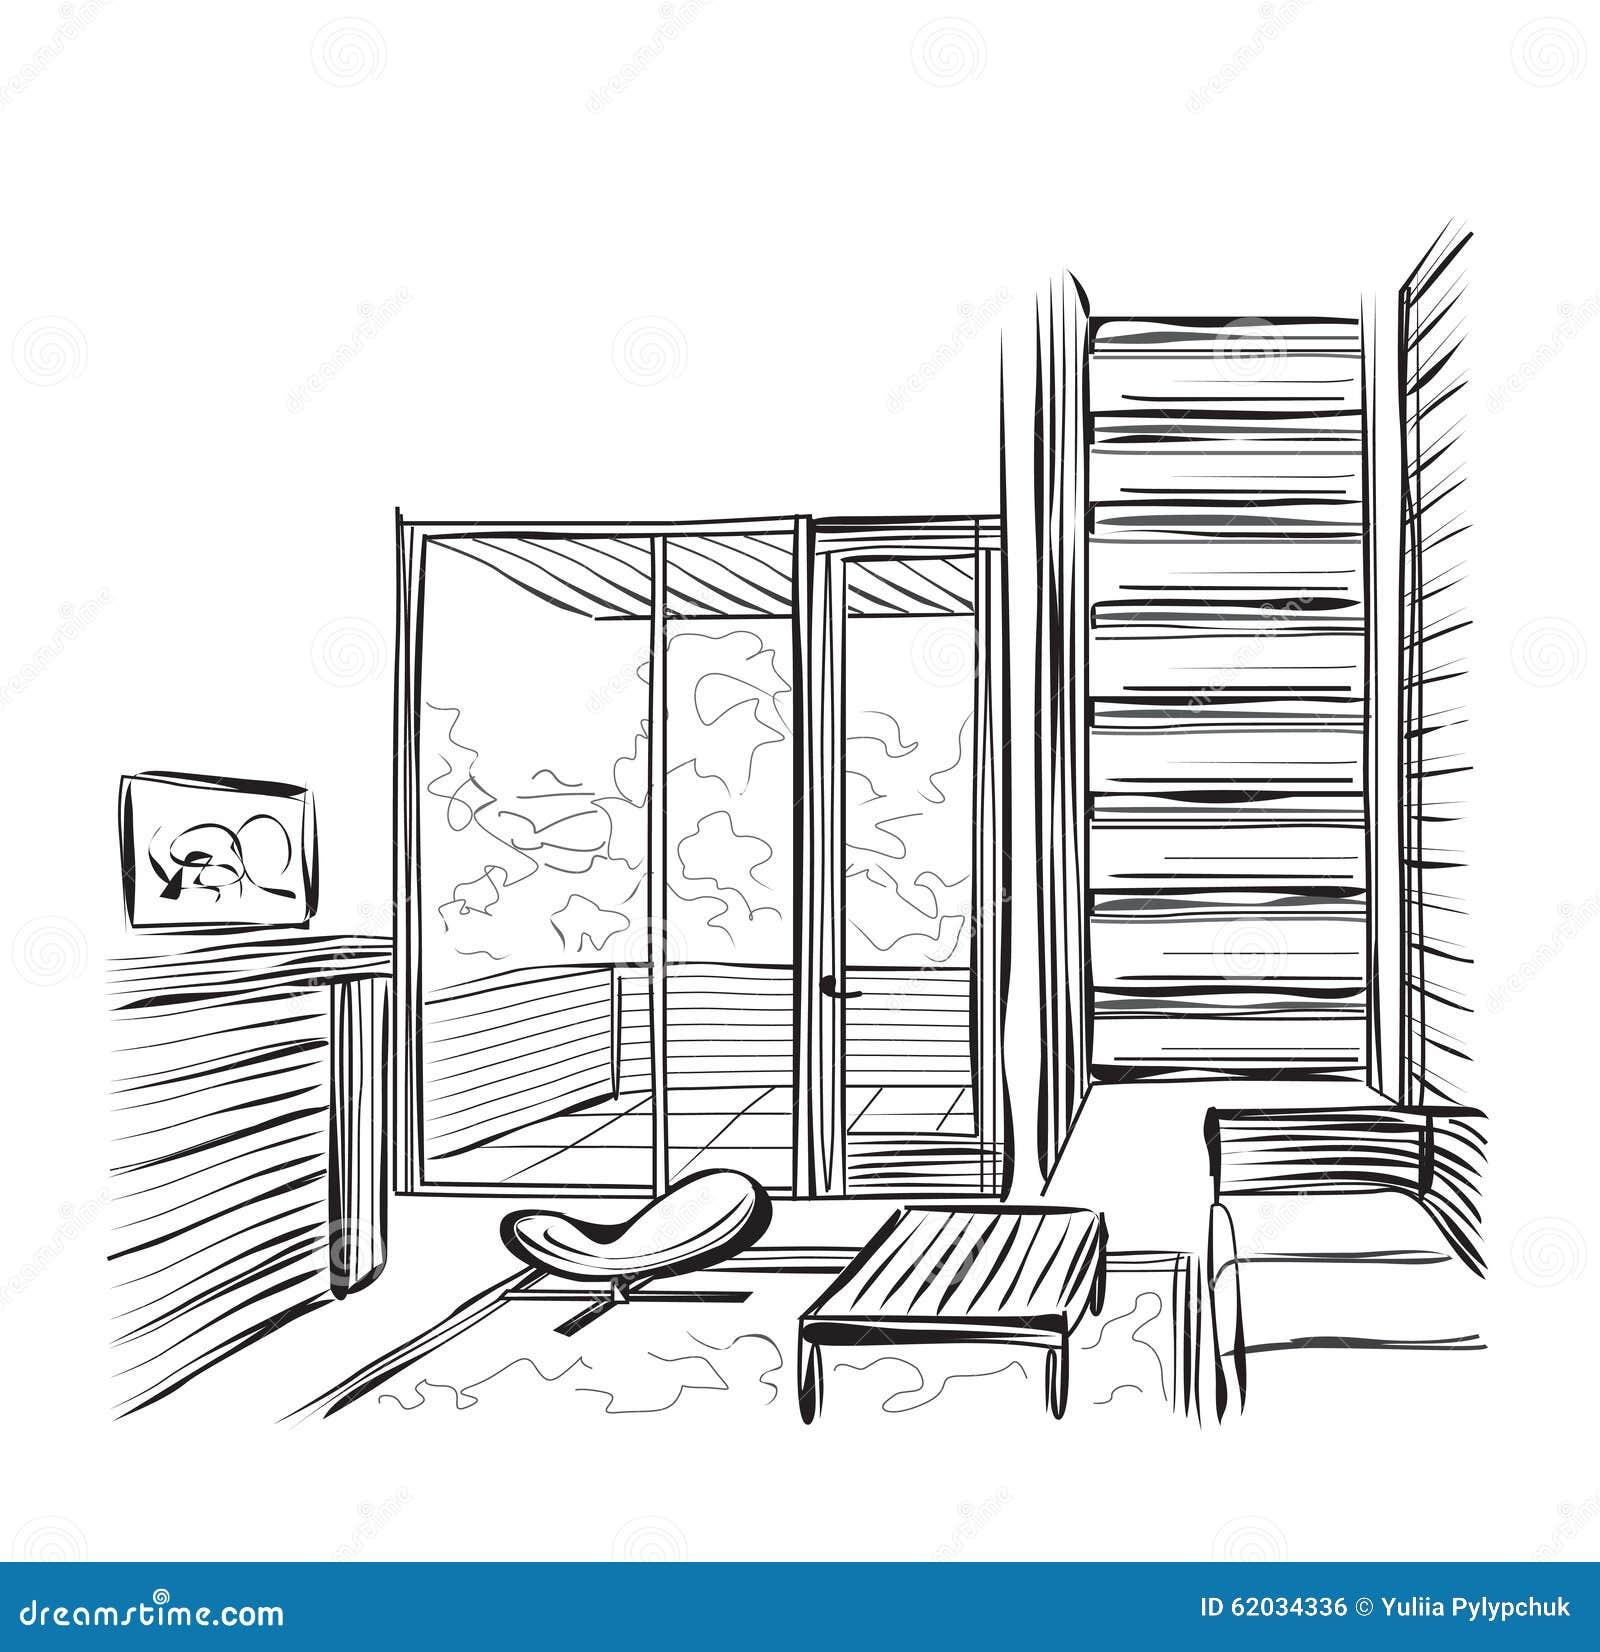 Adventure Time Room Sketch Design